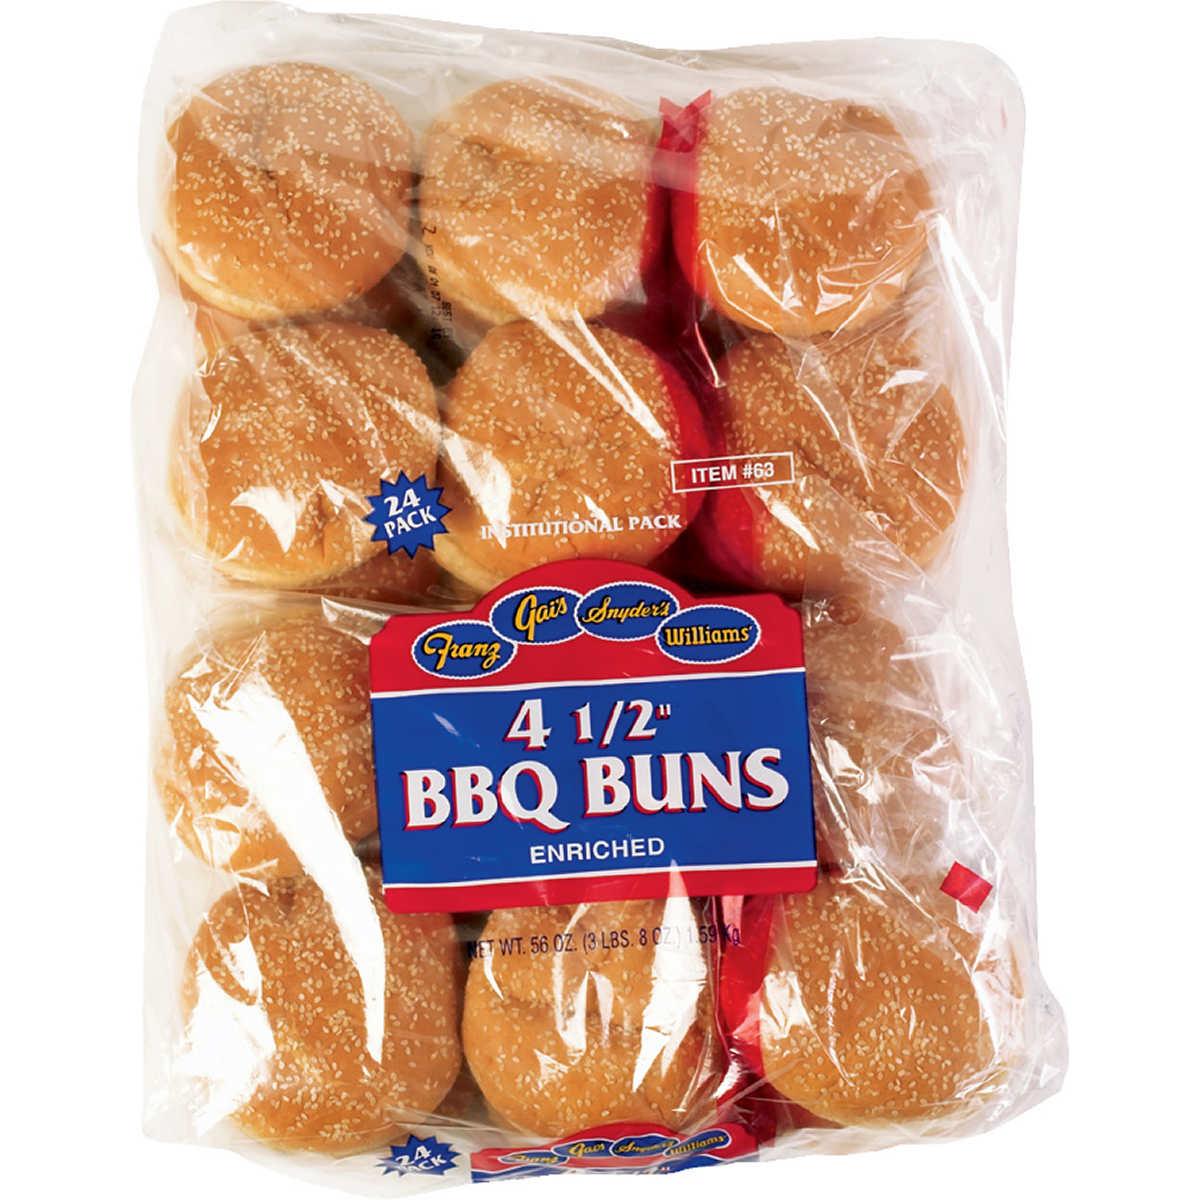 Poppy Seed Hot Dog Buns Costco